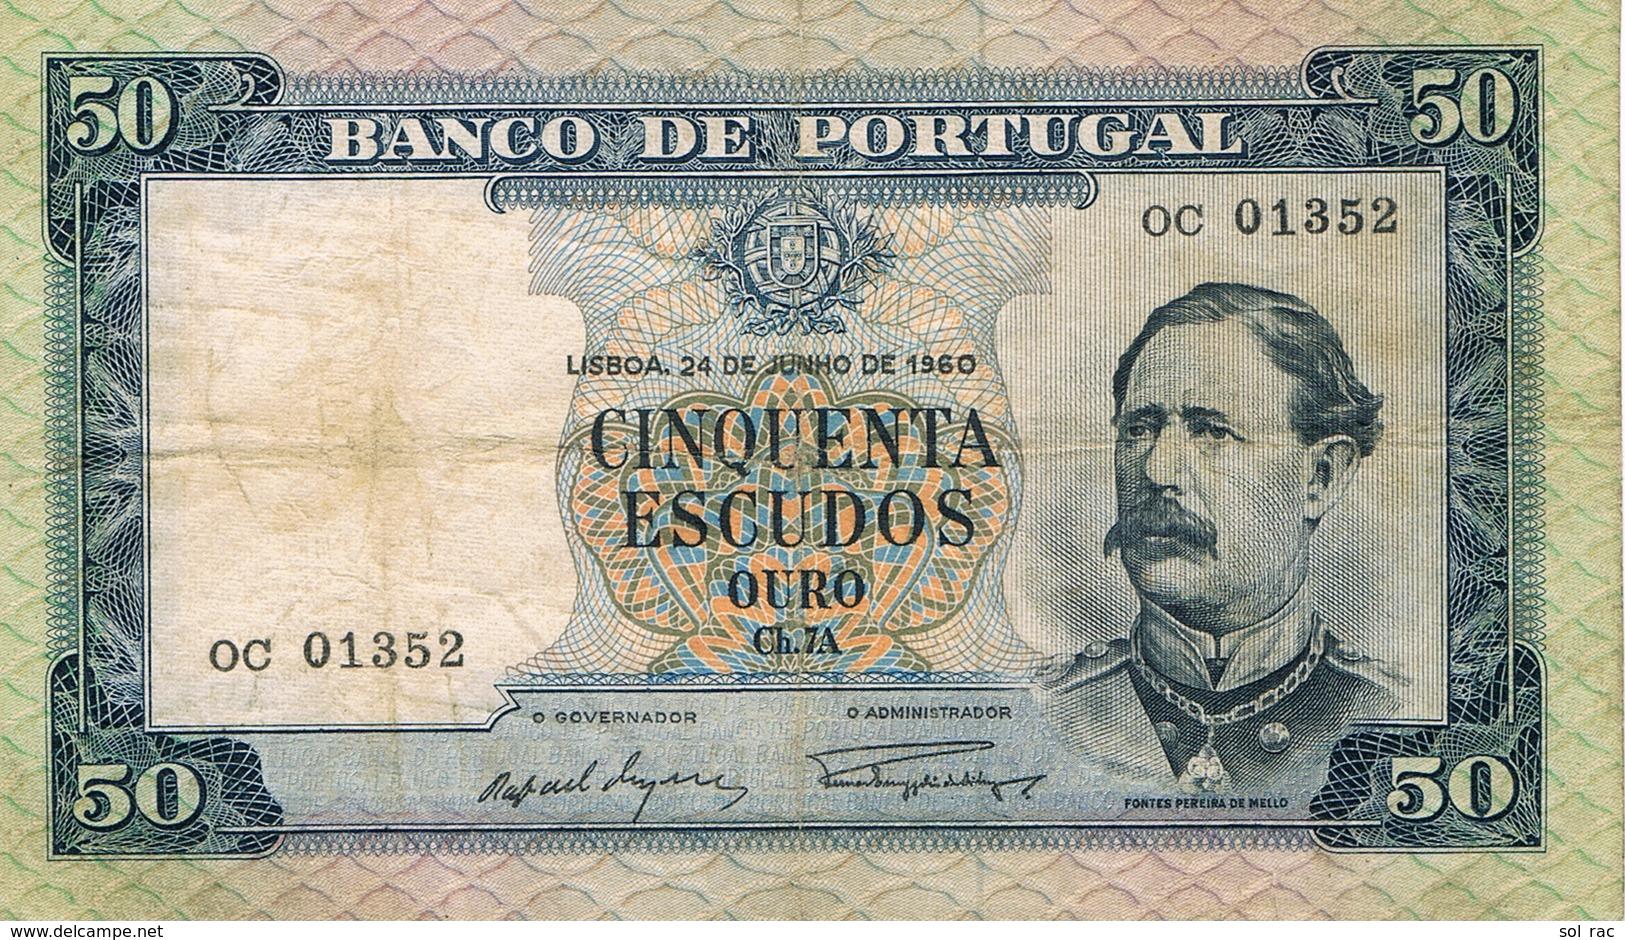 50 ESCUDOS FONTES PEREIRA DE MELLO - CHAPA 7A - DE 24 DE JULHO DE 1960-BANCO DE PORTUGAL - Portugal